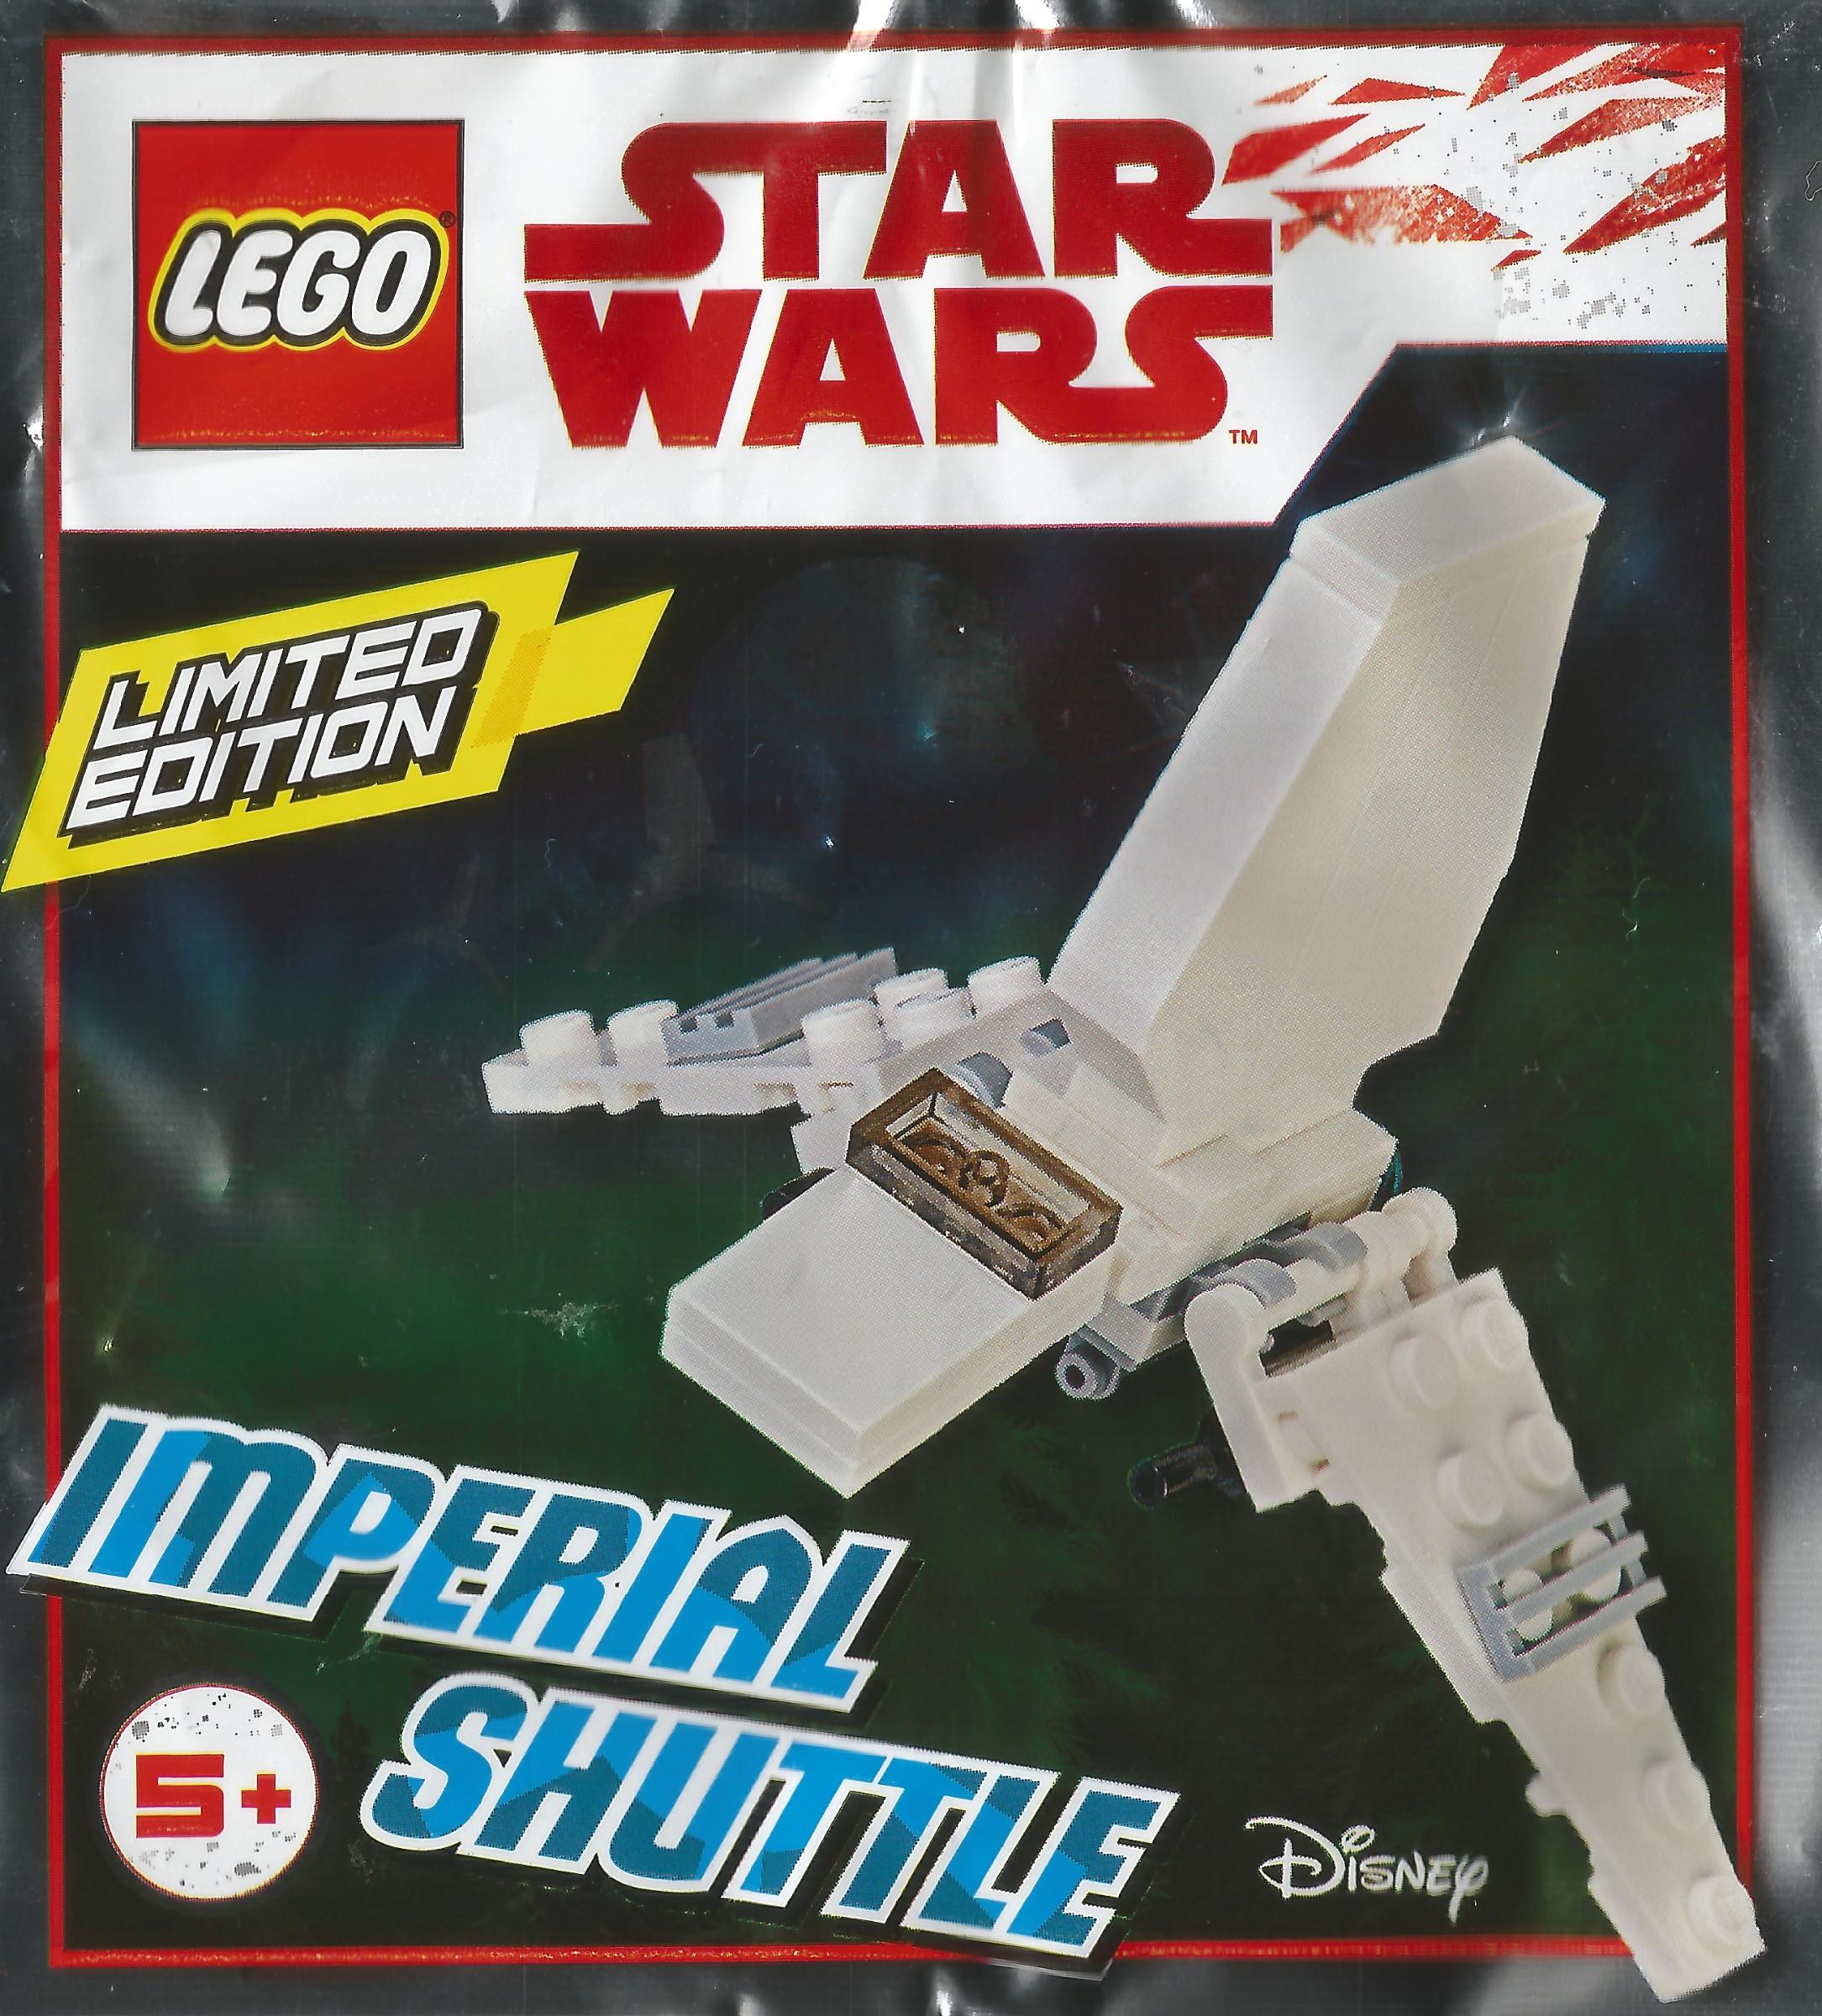 911833 Imperial Shuttle